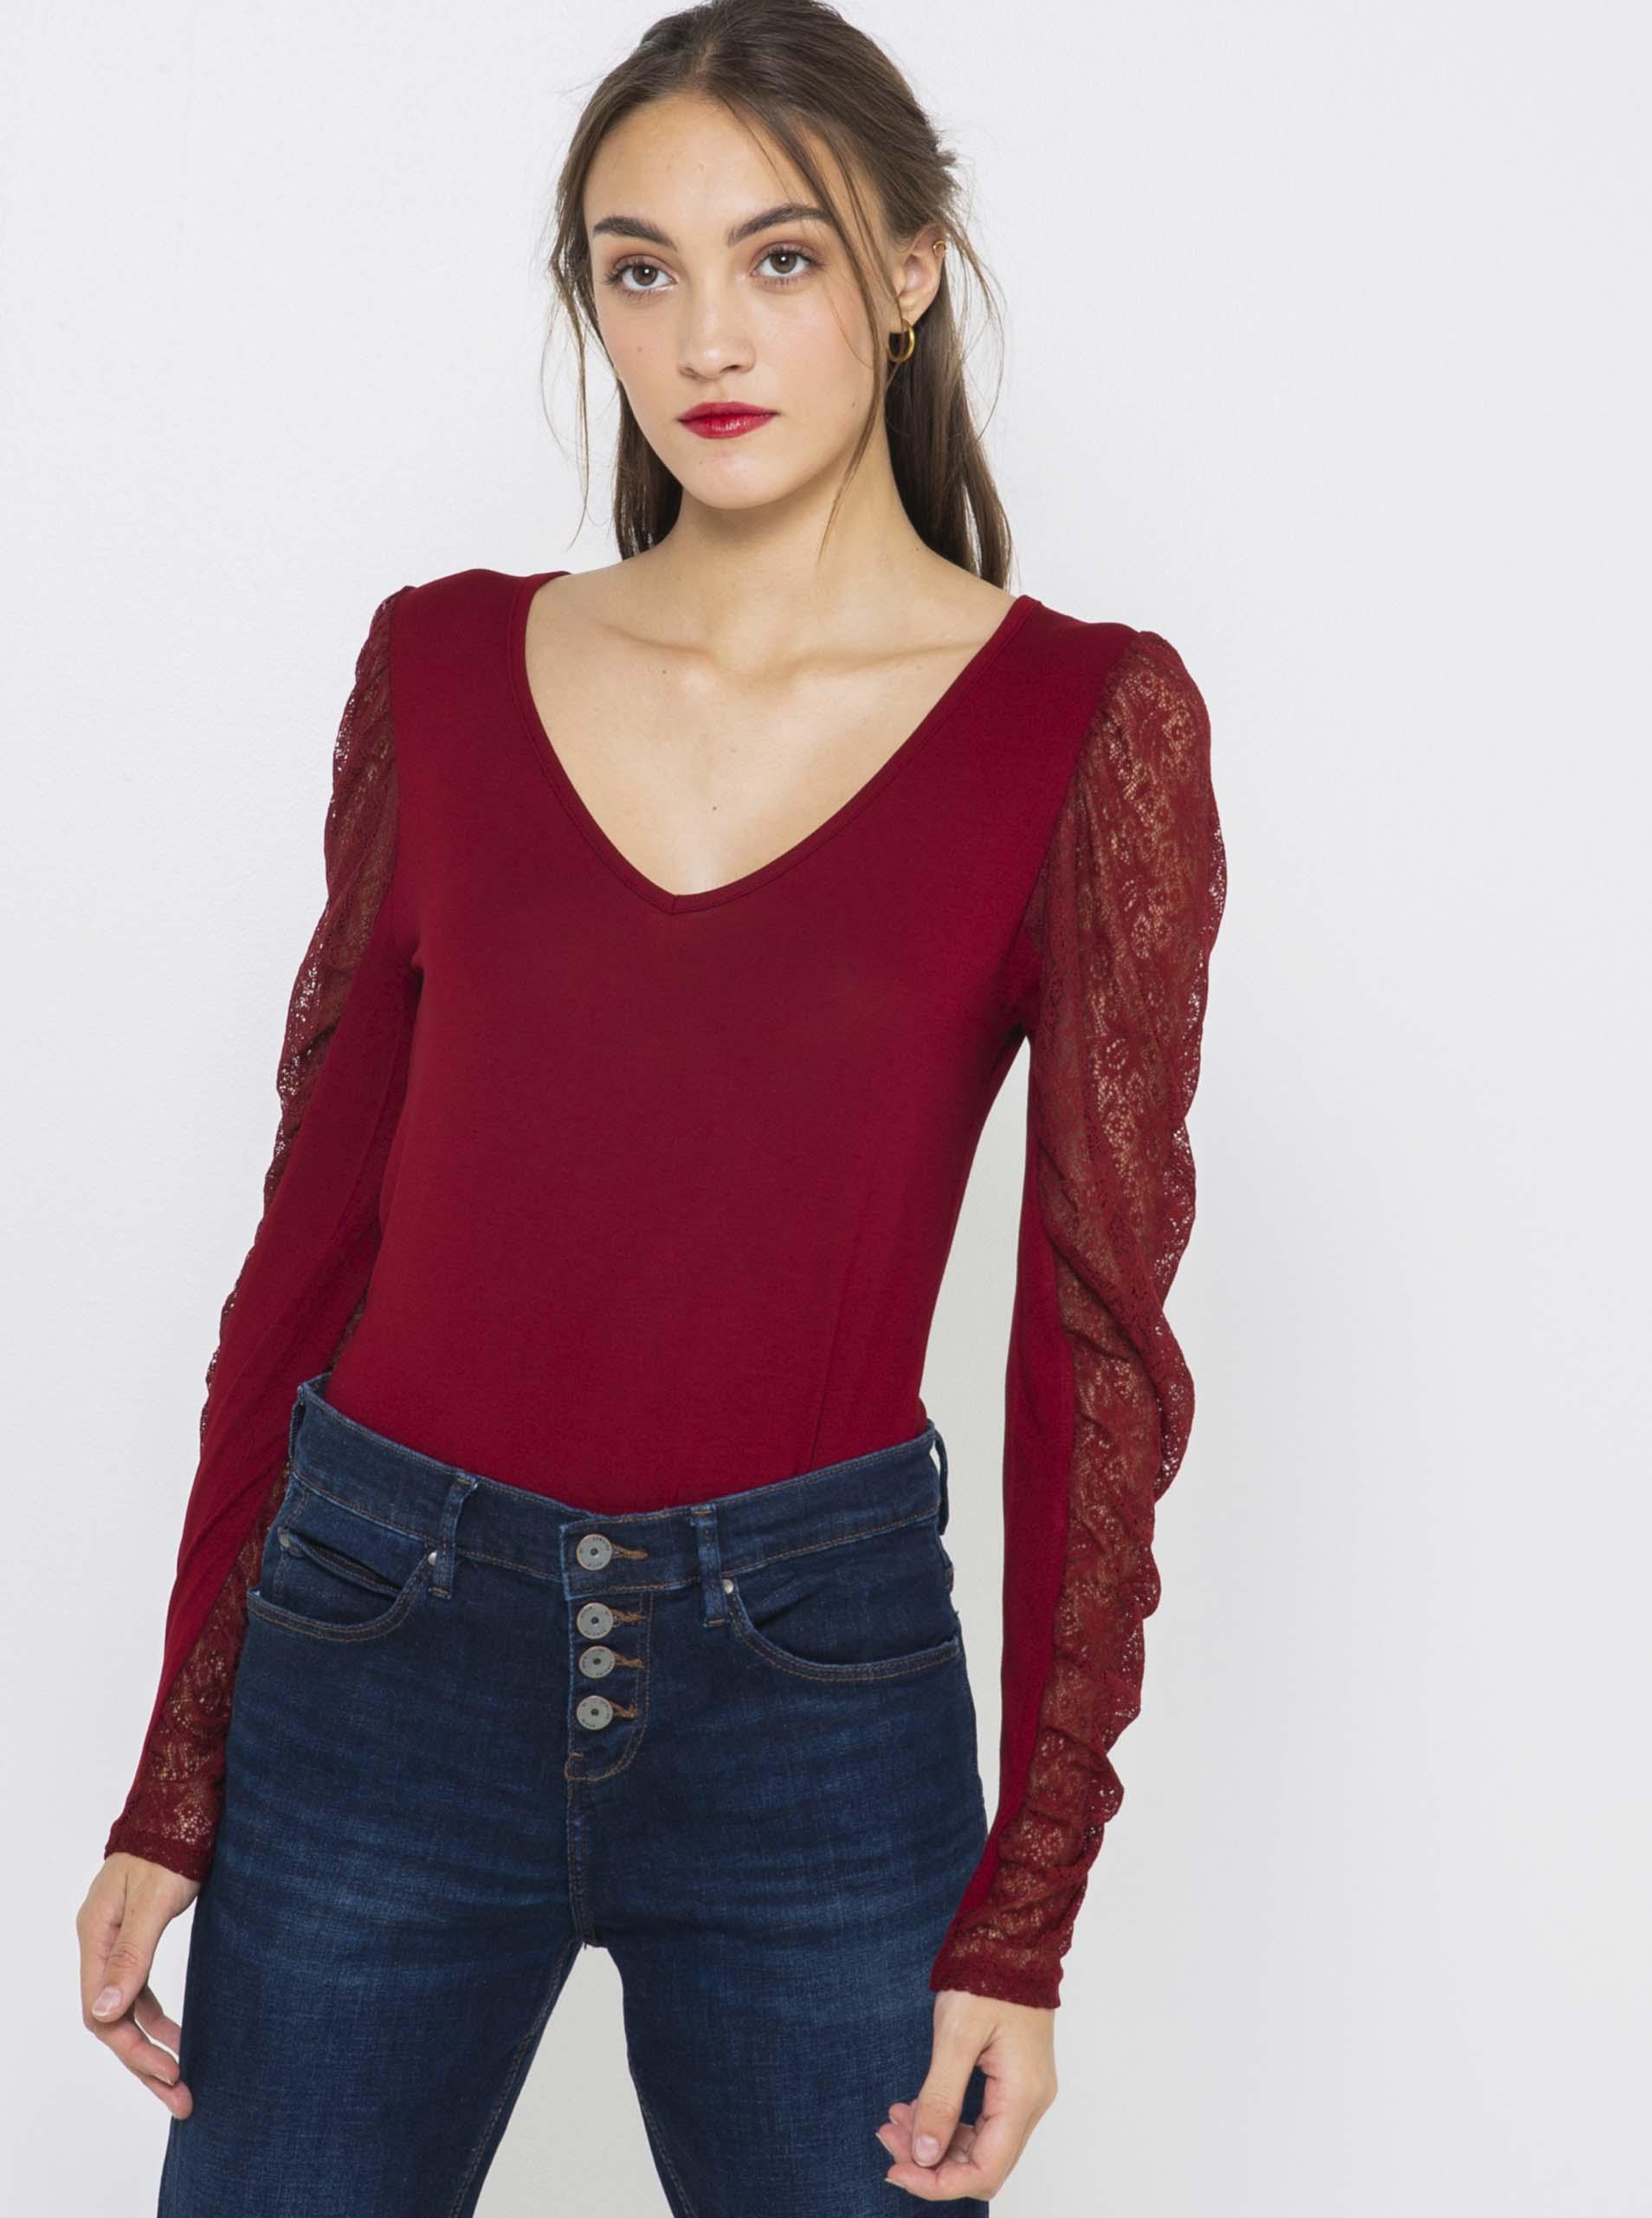 CAMAIEU Women's t-shirt wine red